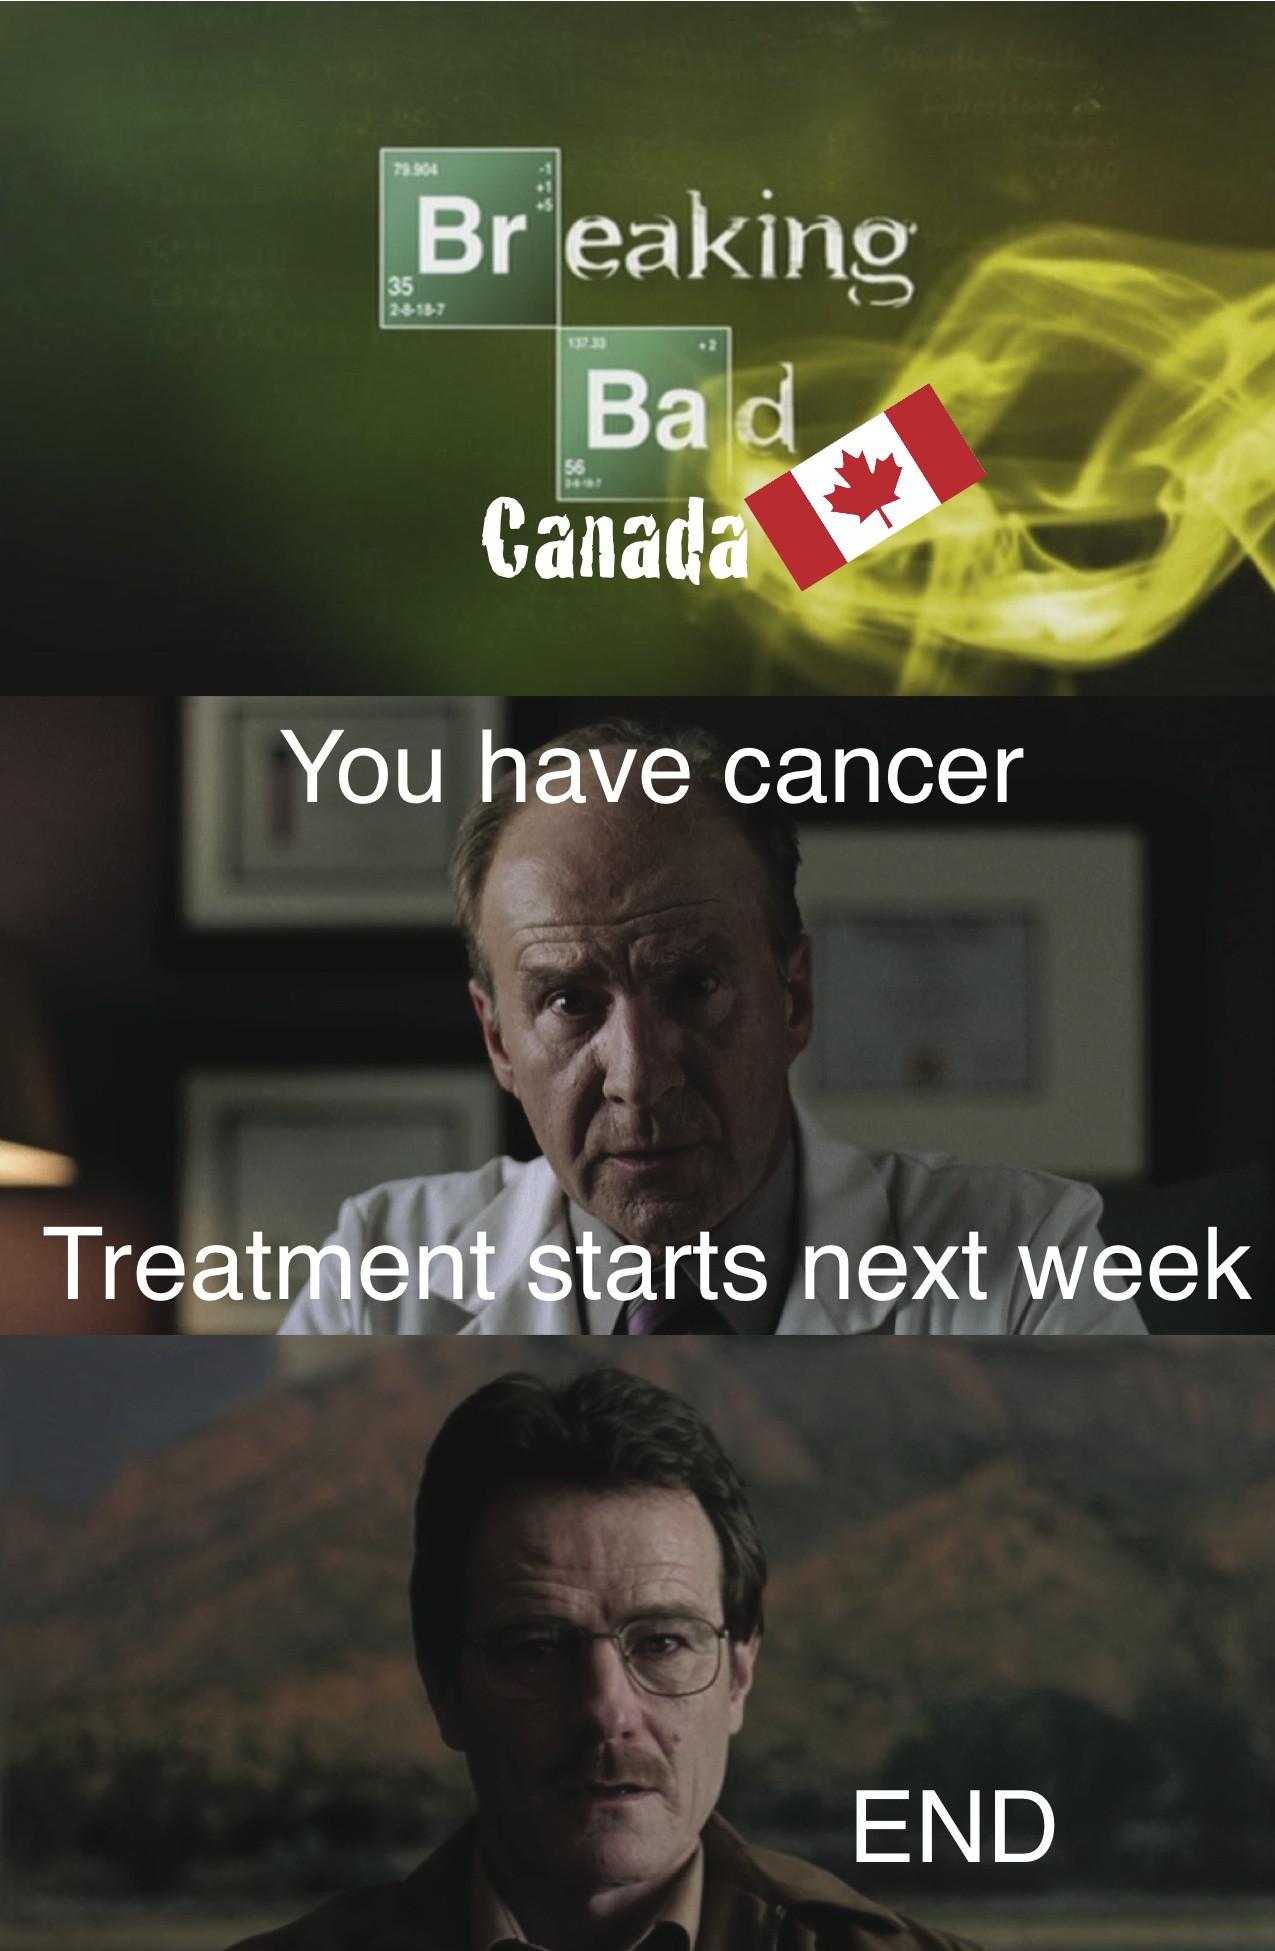 breaking-bad-canada